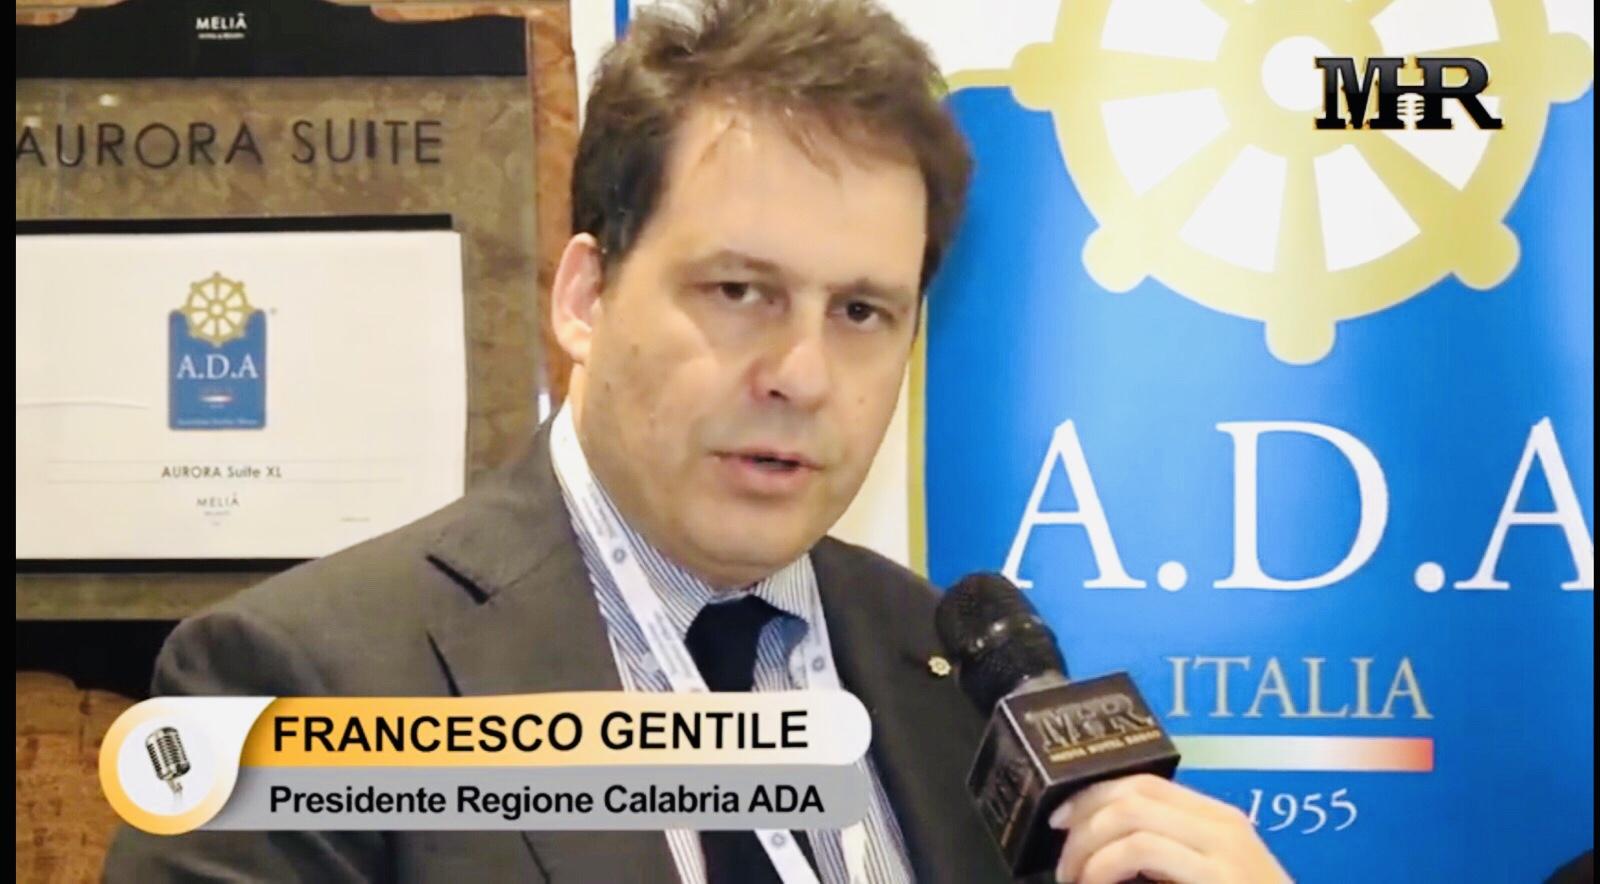 65 ^congresso A.D.A.: intervista al Presidente Regionale Ada Calabria Francesco Gentile